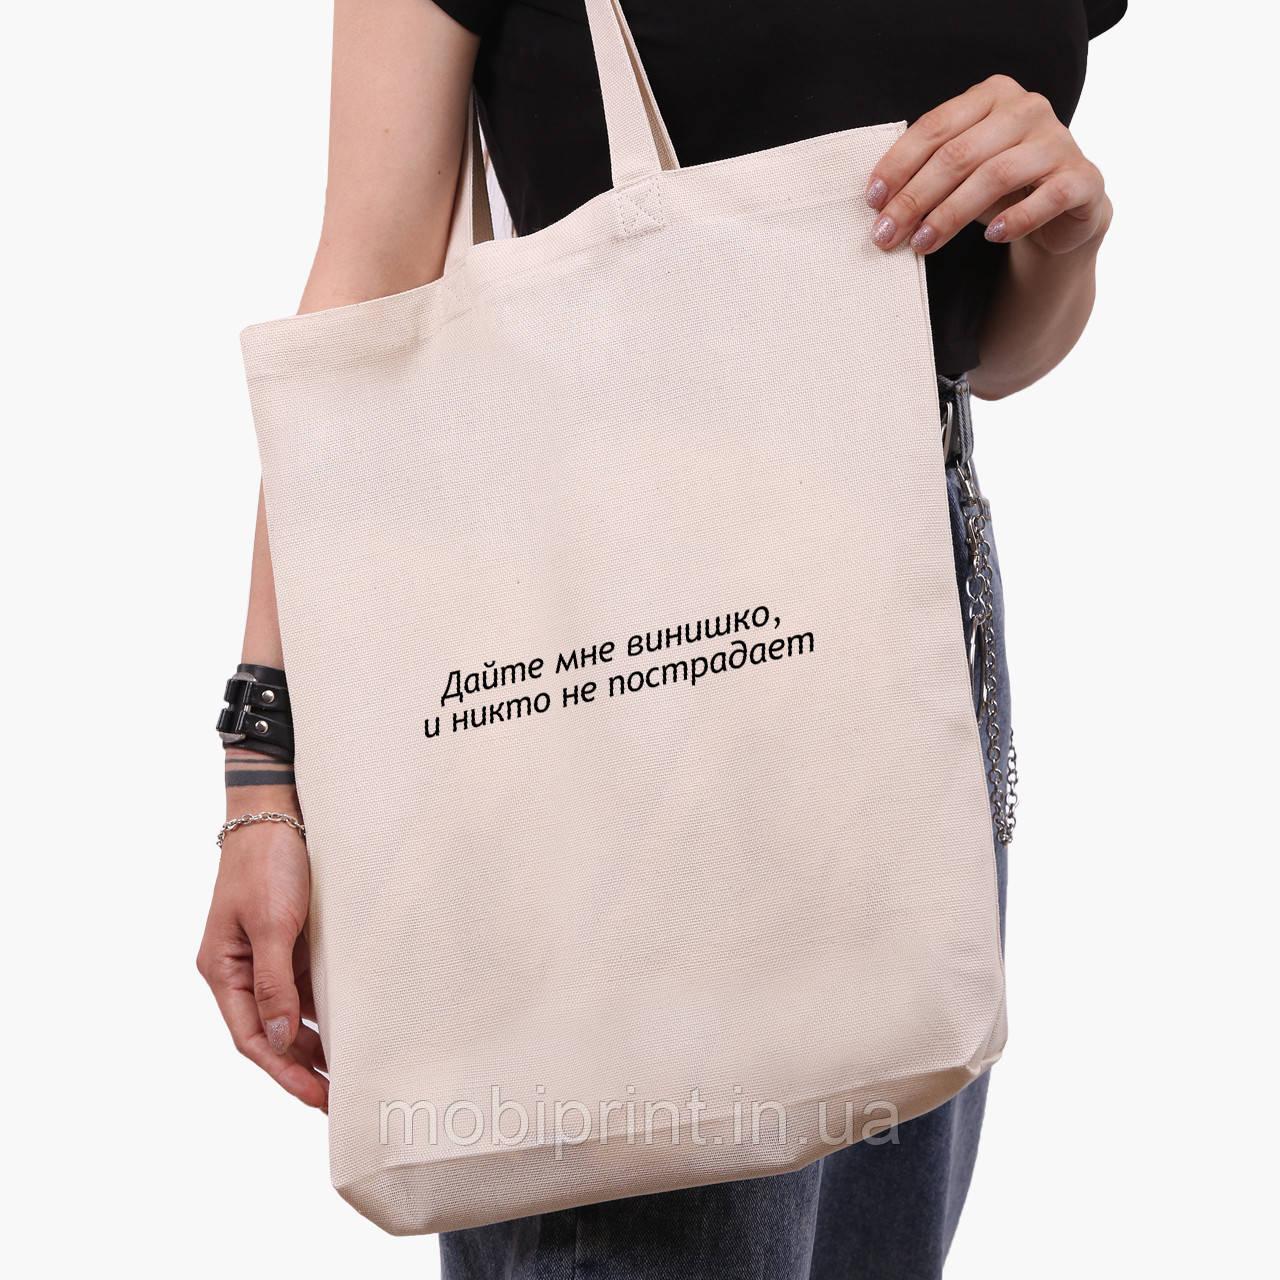 Эко сумка шоппер белая Дайте мне винишко (Give me wine) (9227-1293-1)  41*39*8 см